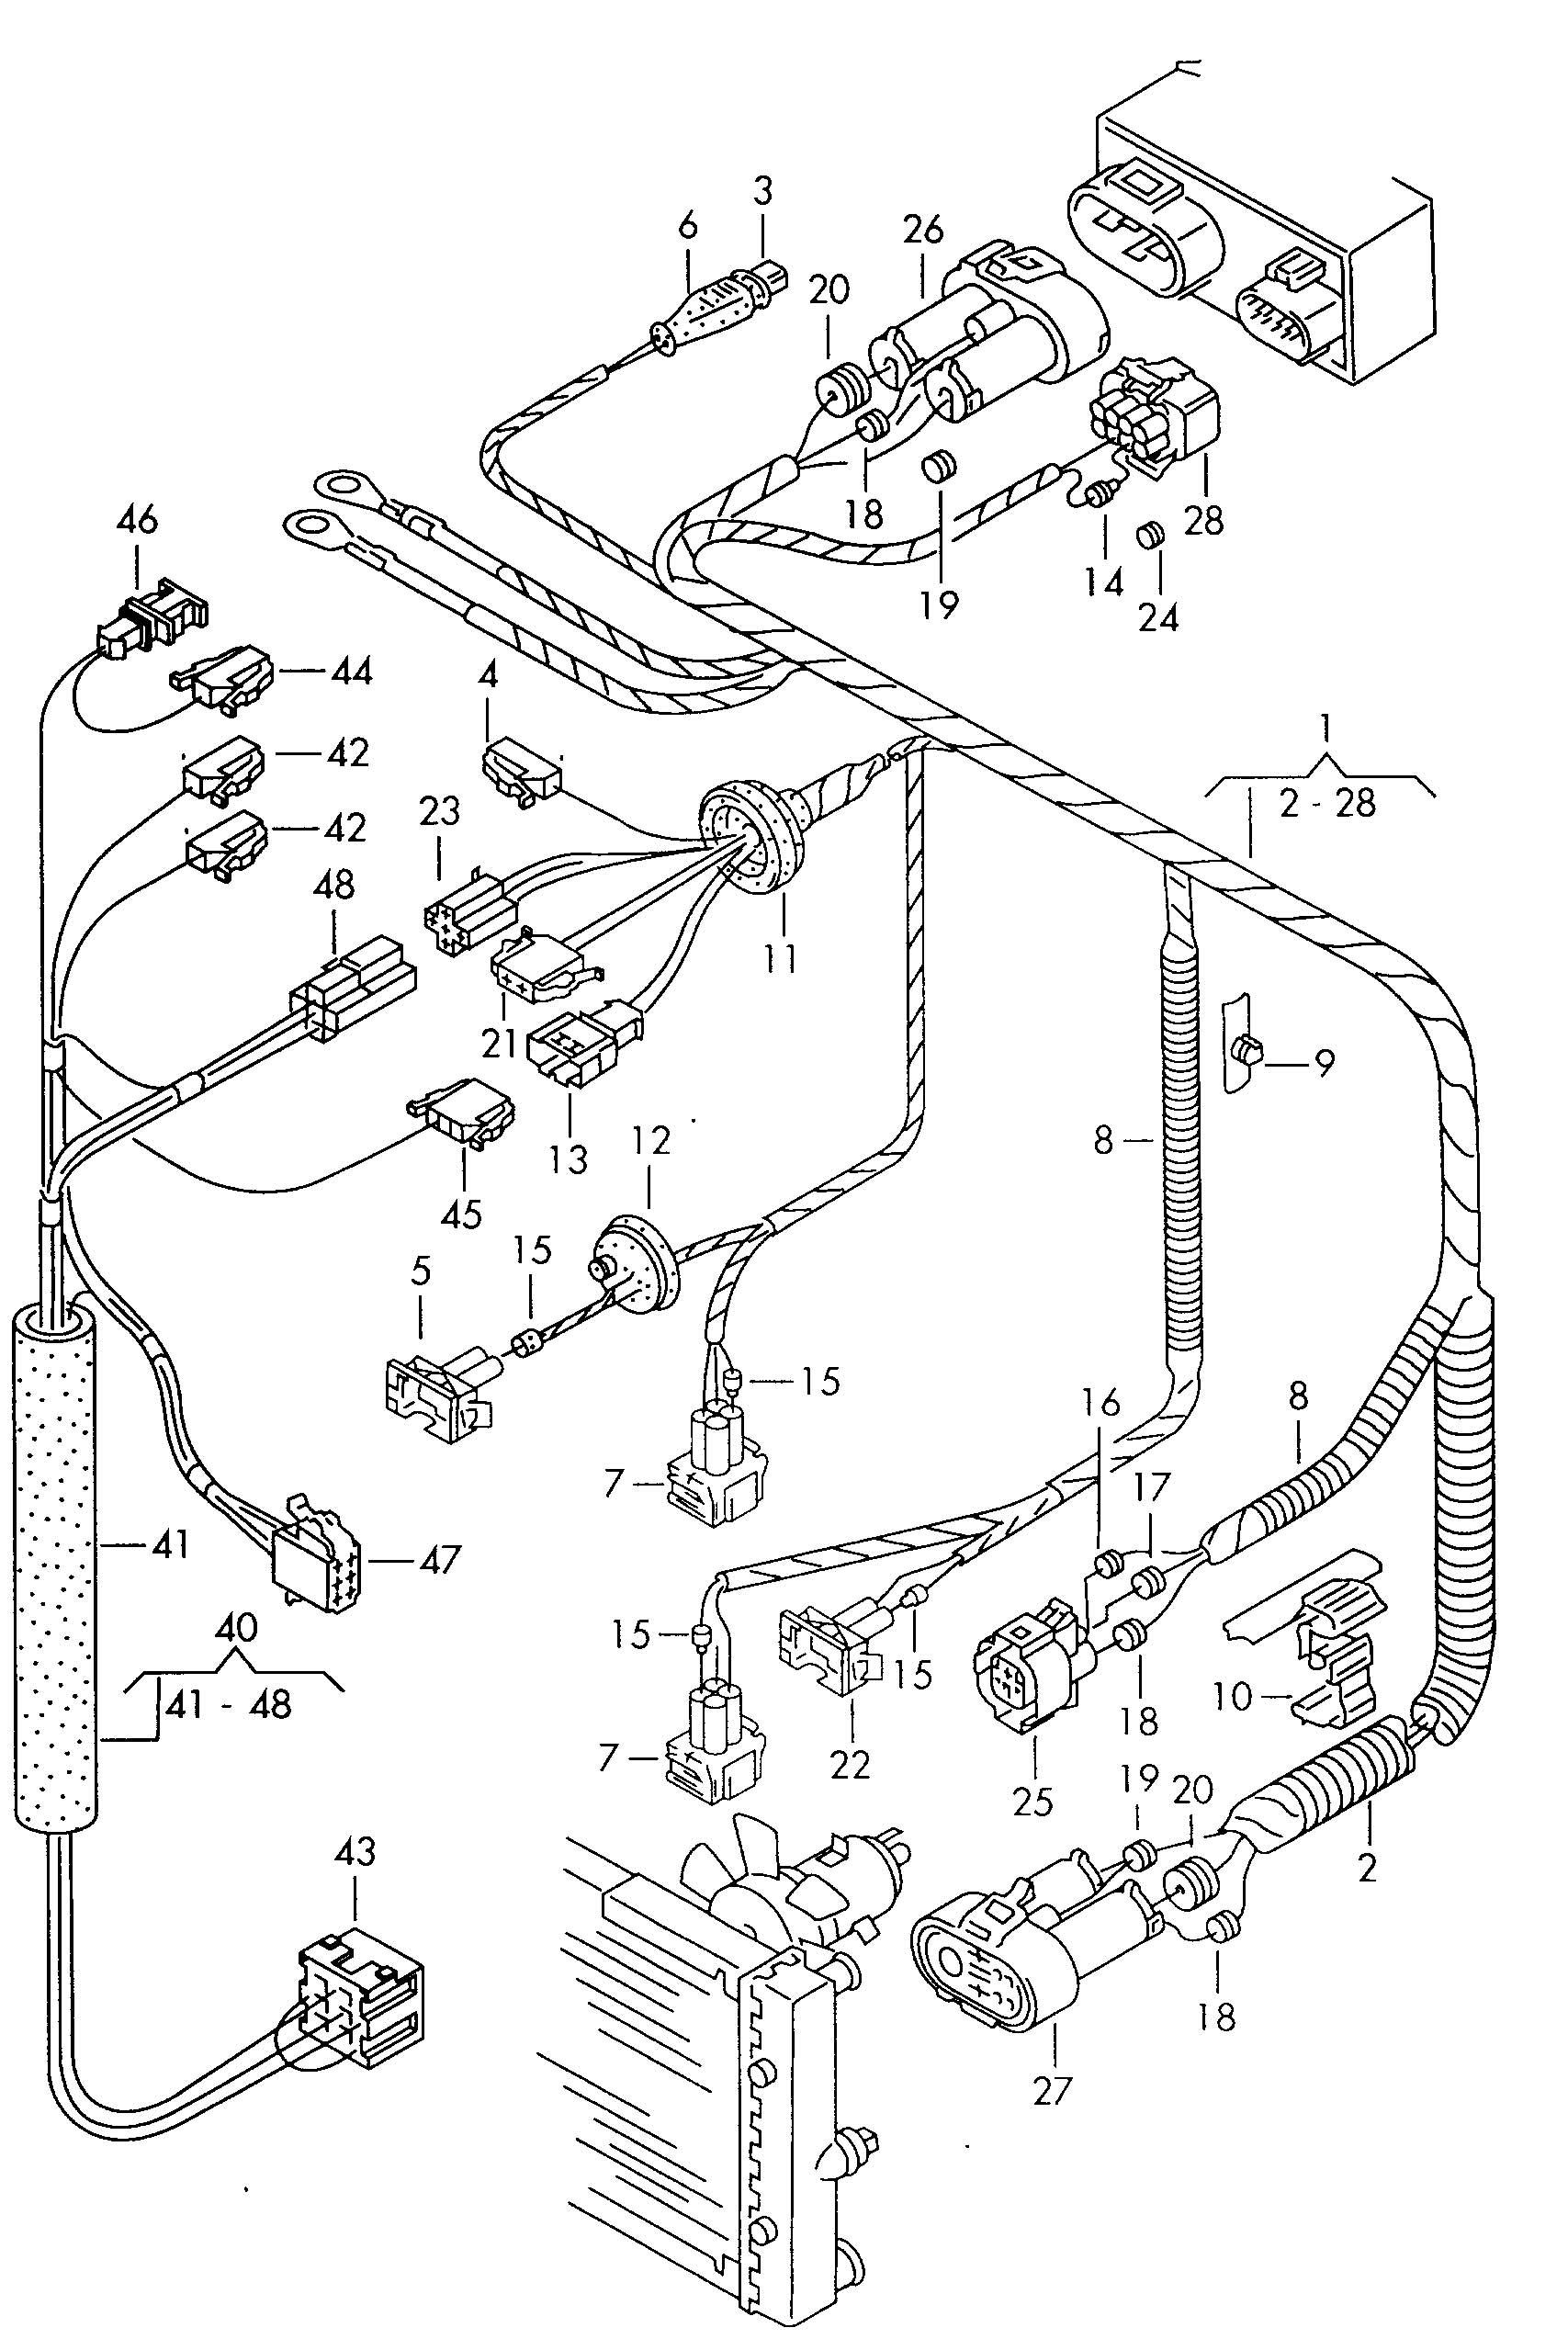 Uhaul Wiring Harness Diagram